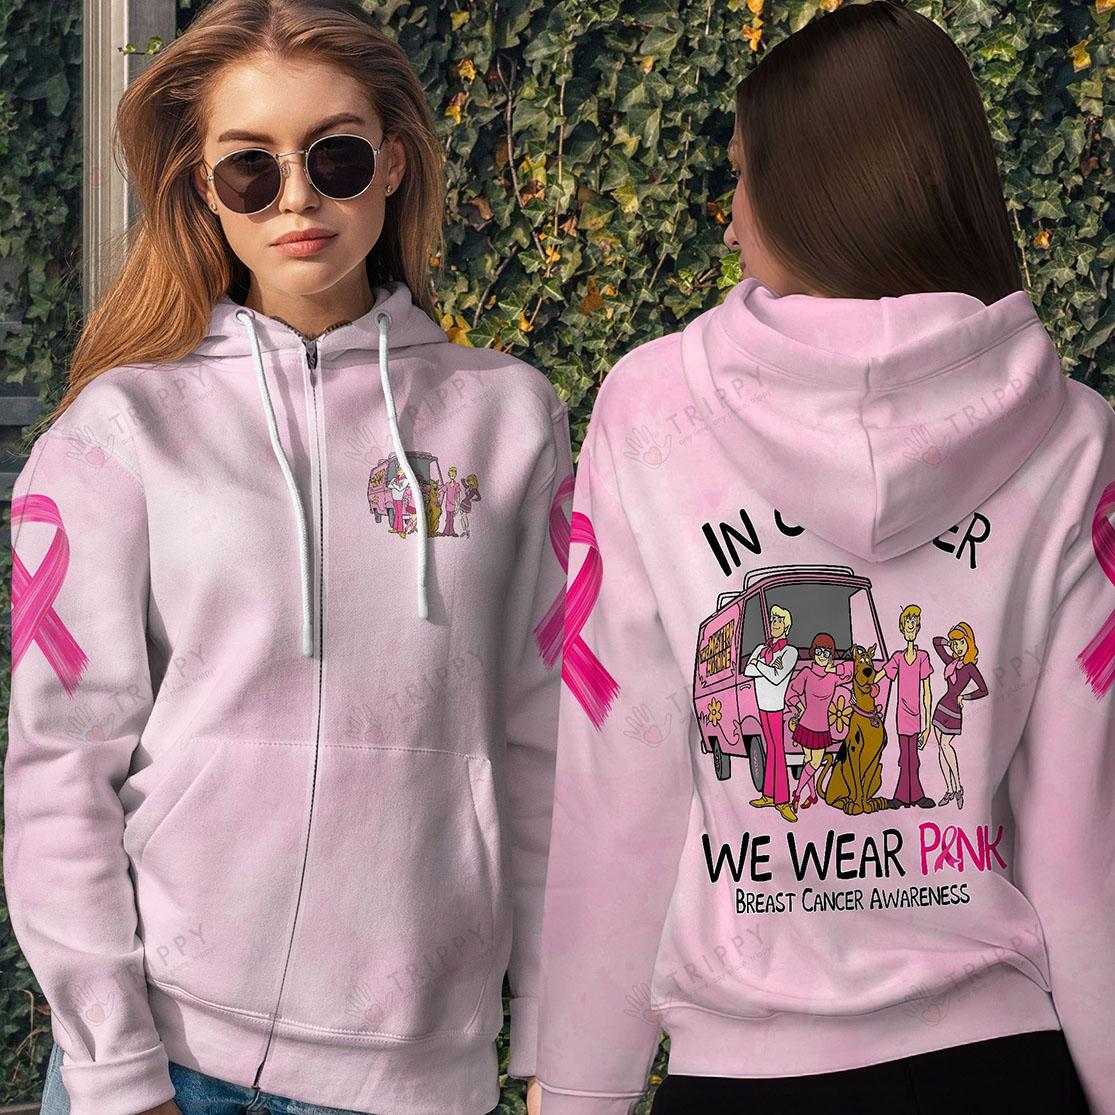 Scooby Doo In October We Wear Pink Breast Cancer Awareness 3D All Over Printed Zip Hoodie